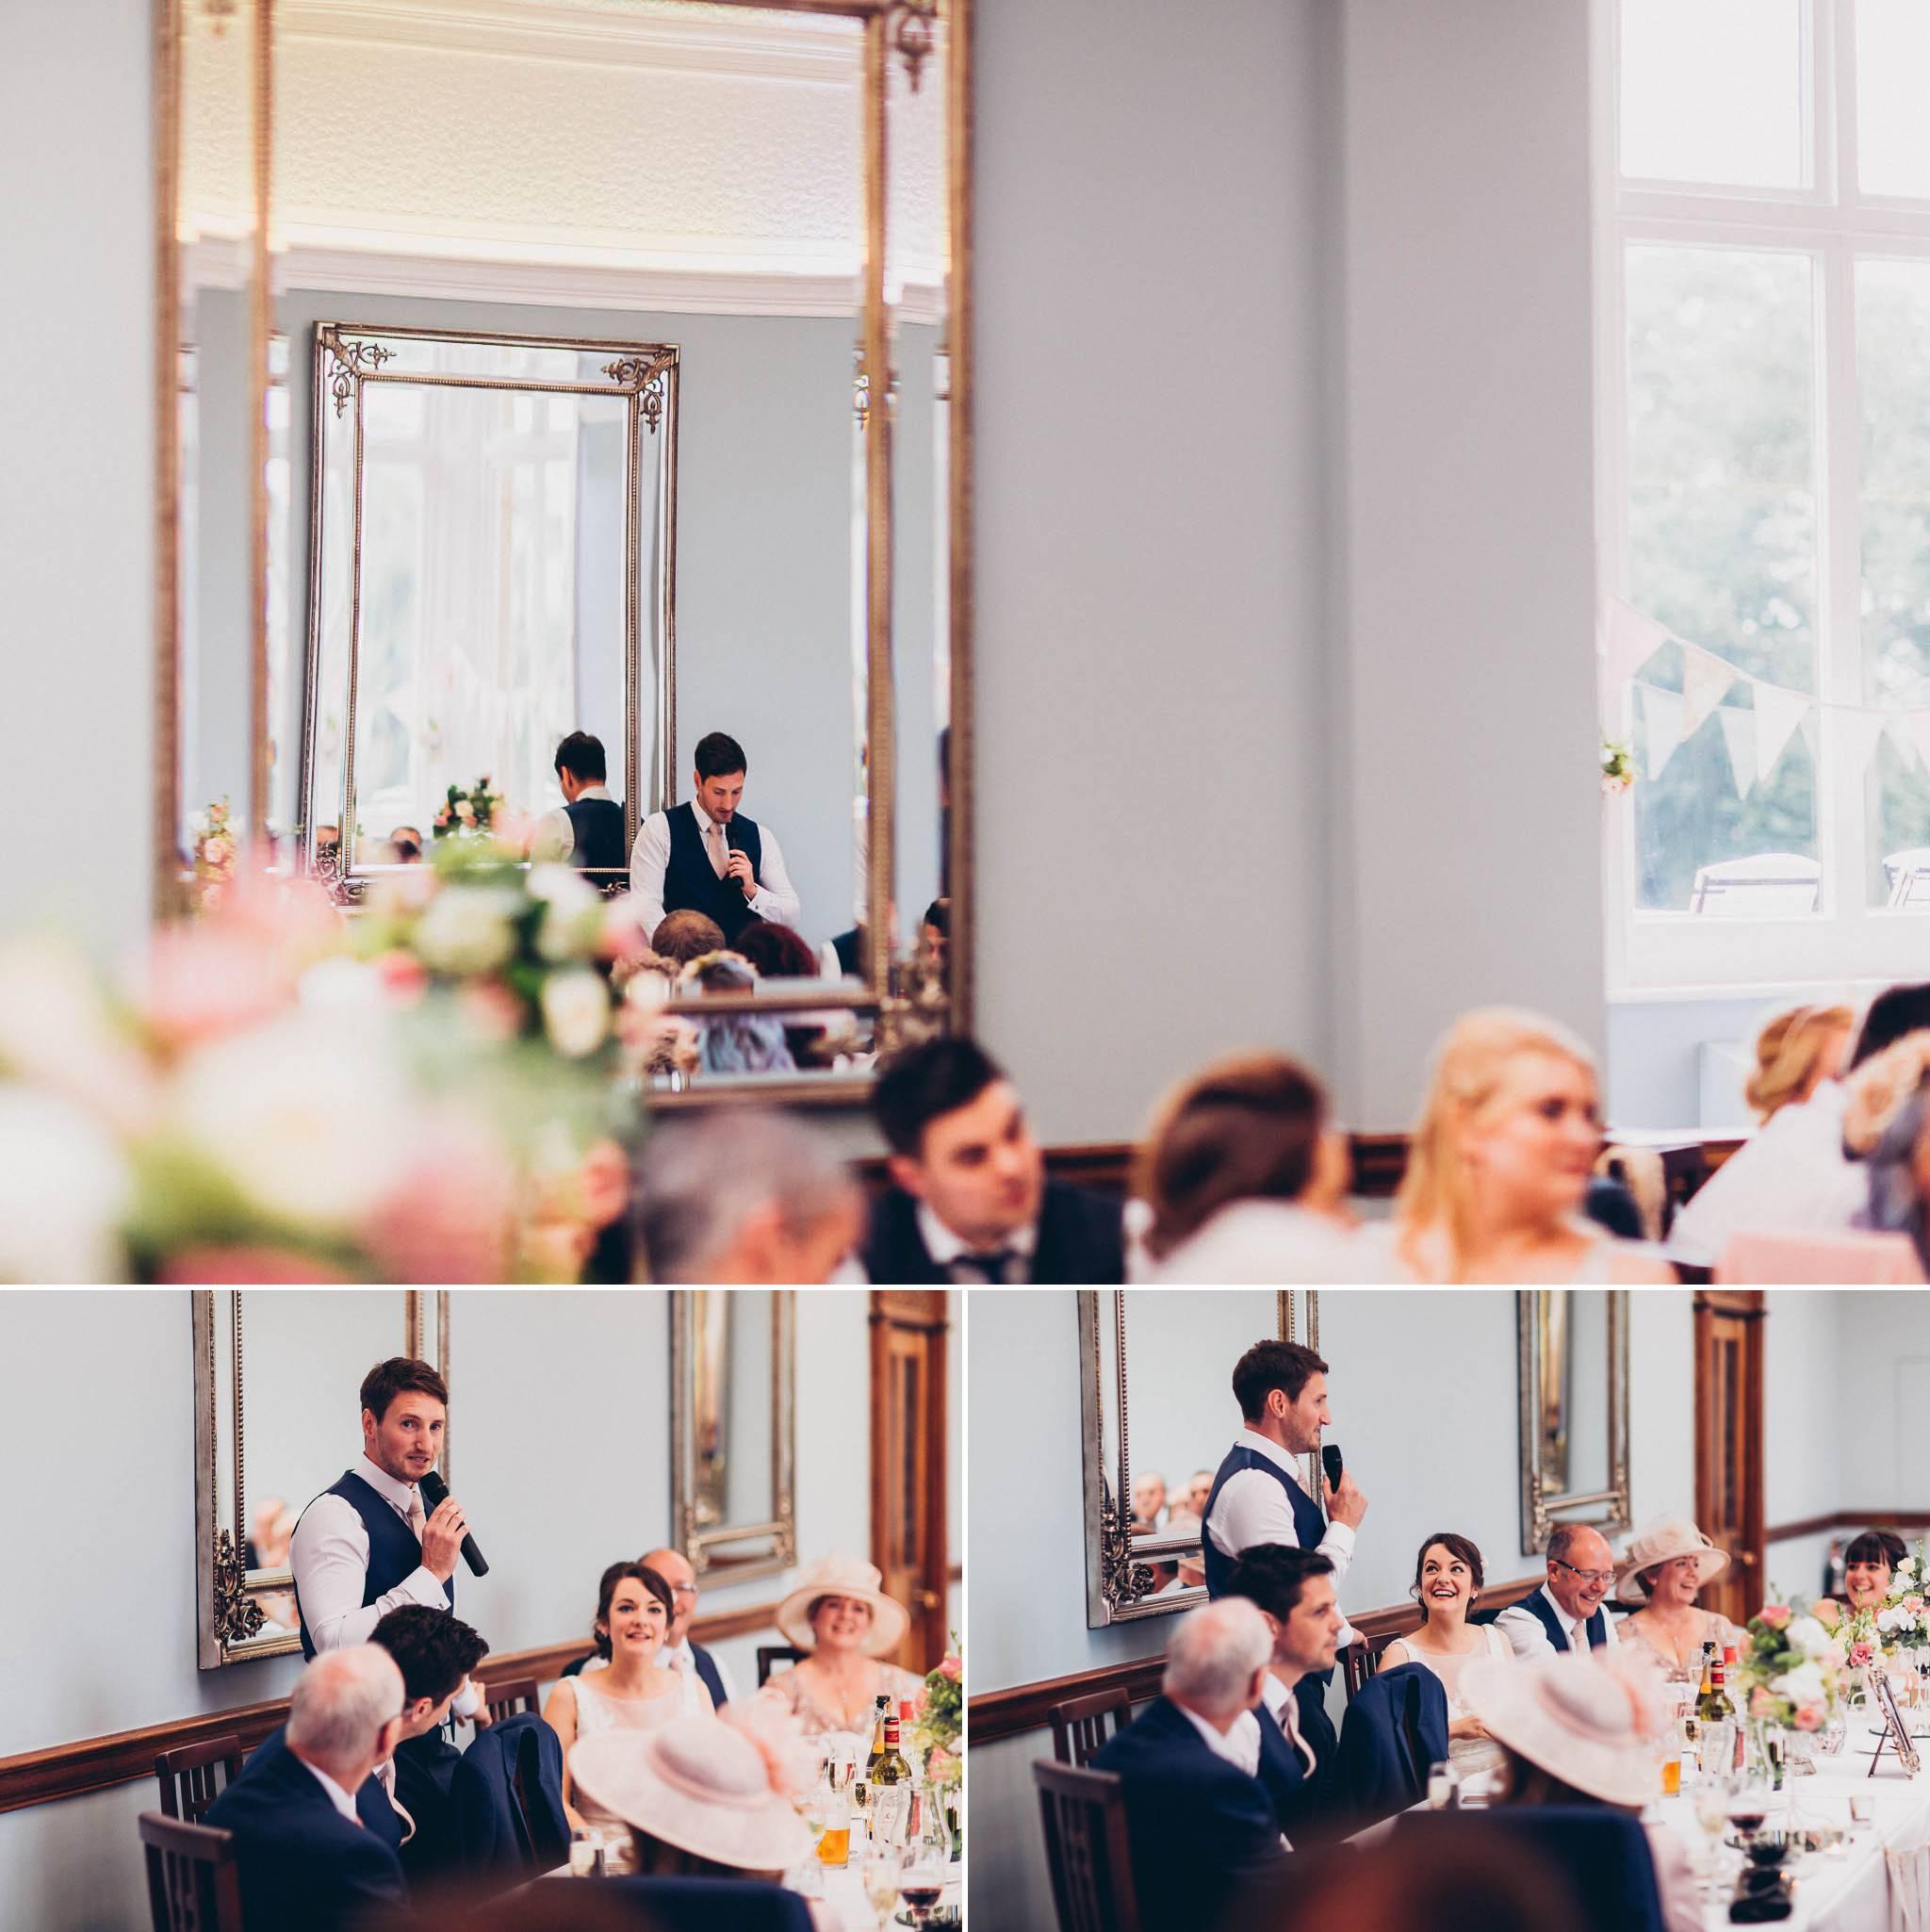 pendrell-hall-wedding-photography 19.jpg